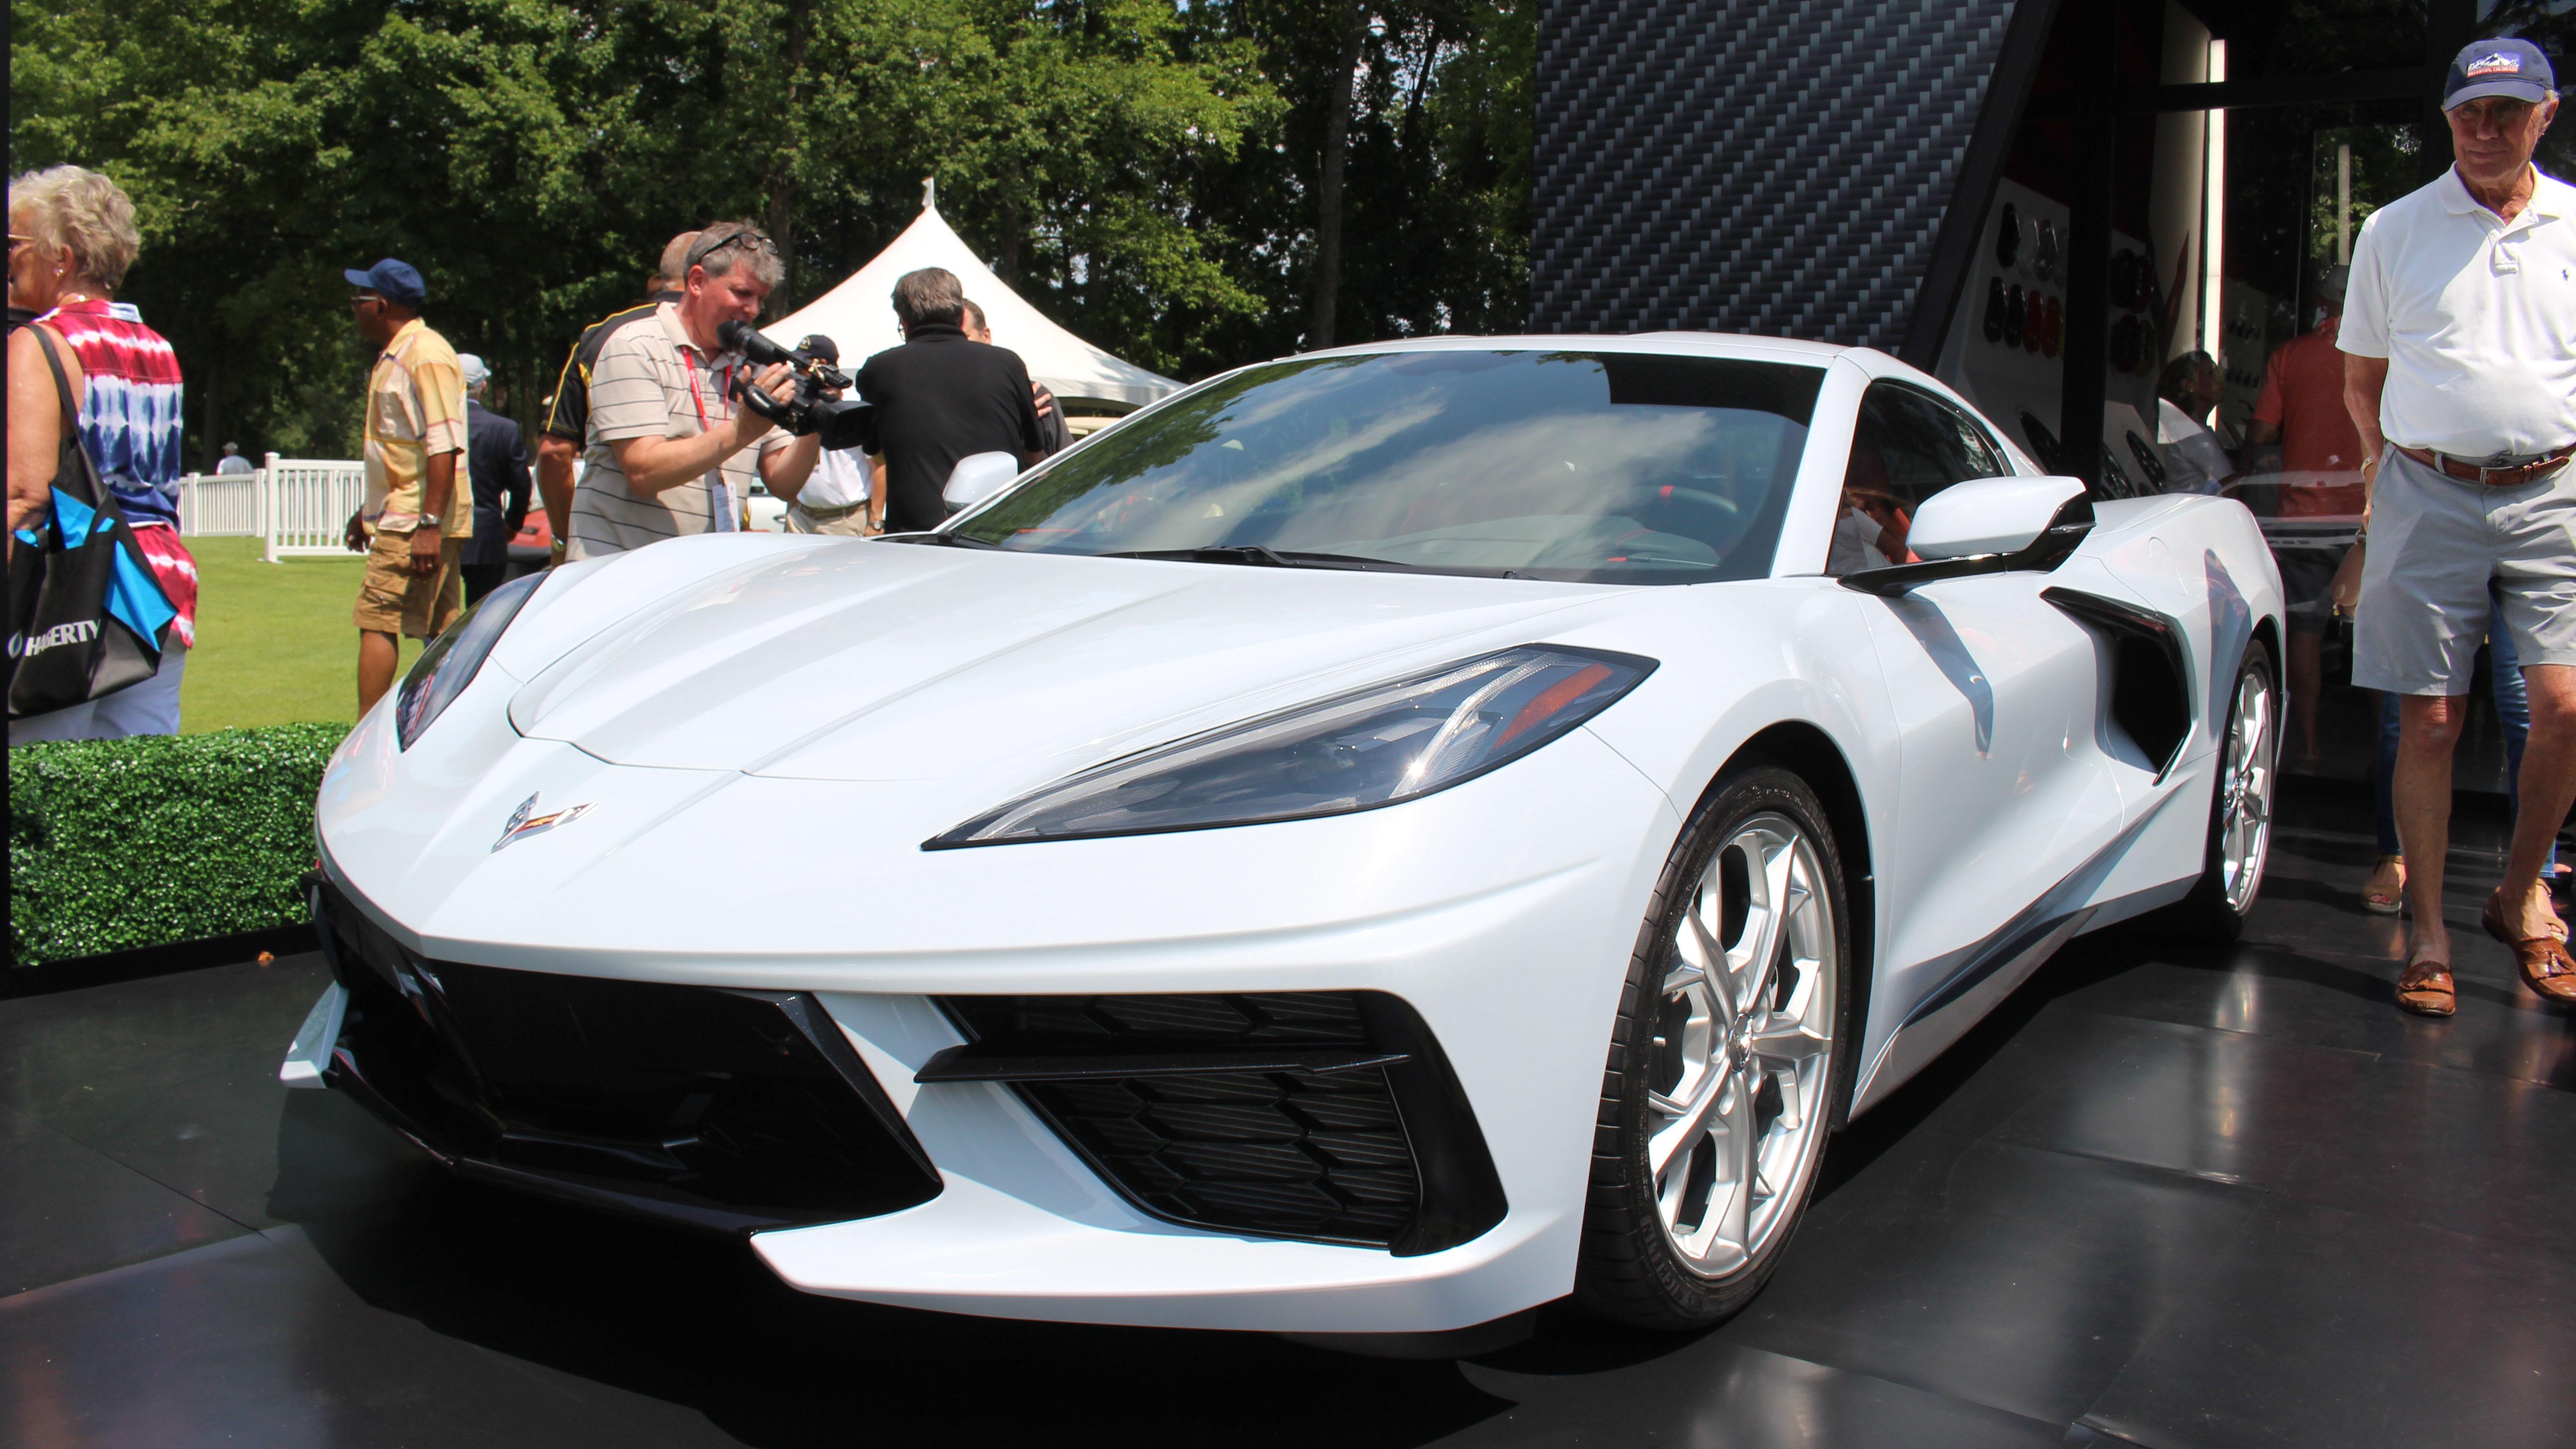 2020 Chevy Corvette Stingray C8 official order guide reveals details | Autoblog